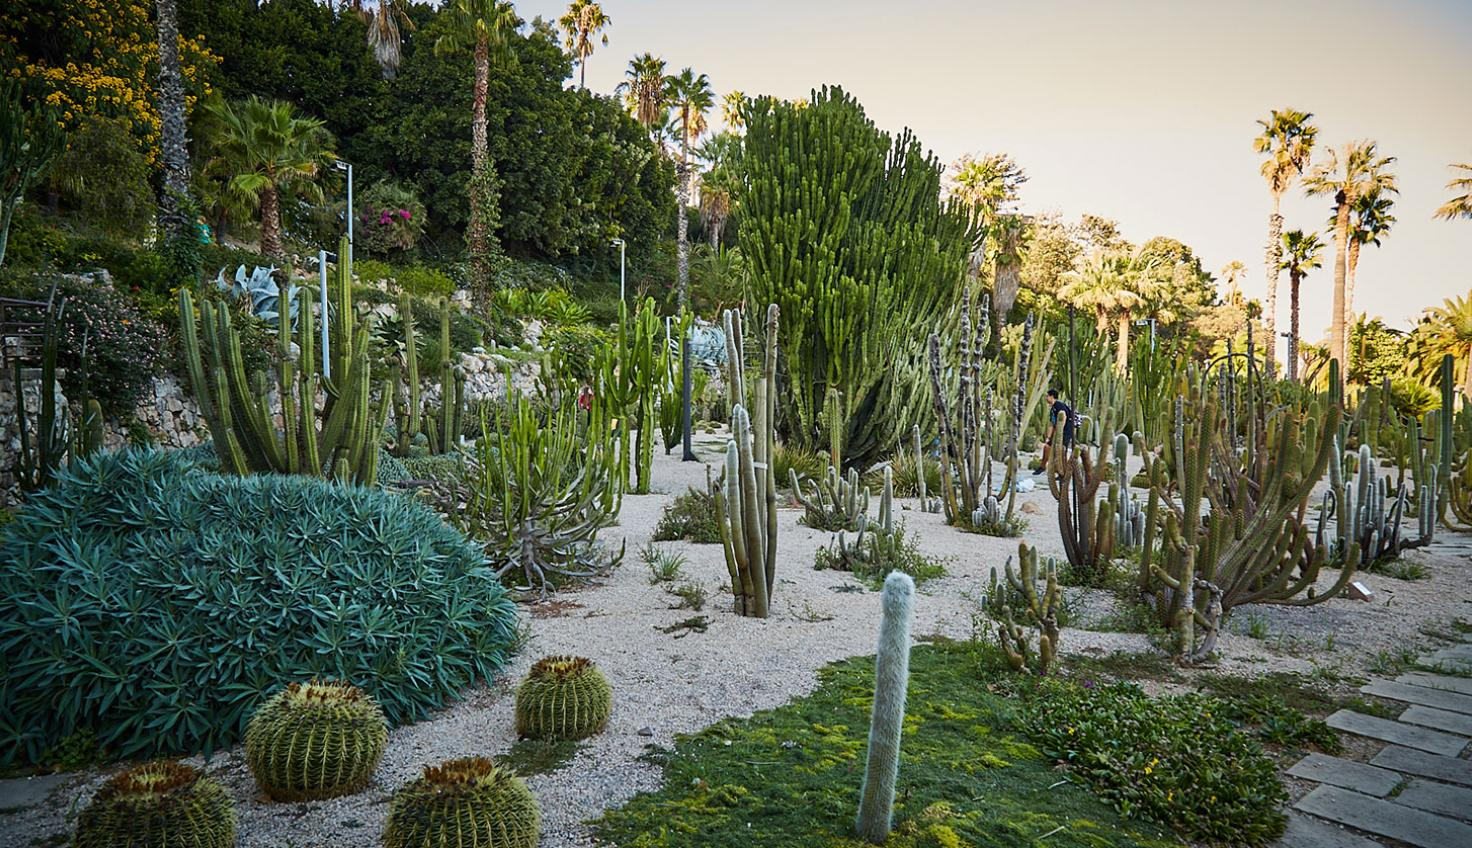 Photo Costa i Llobera Gardens